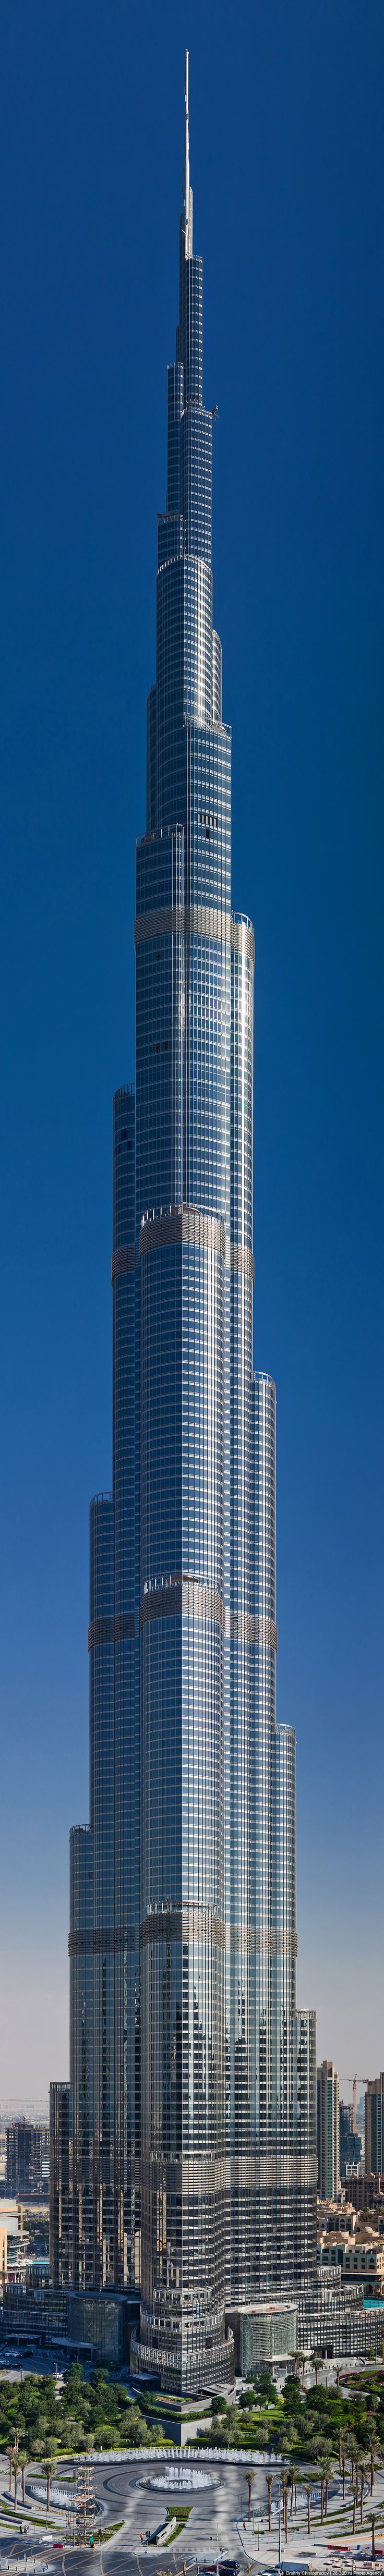 DUBAI | Burj Khalifa (Burj Dubai) | World's Tallest Structure | 828m | 2717ft  (and it is not in the U.S., Honey!)